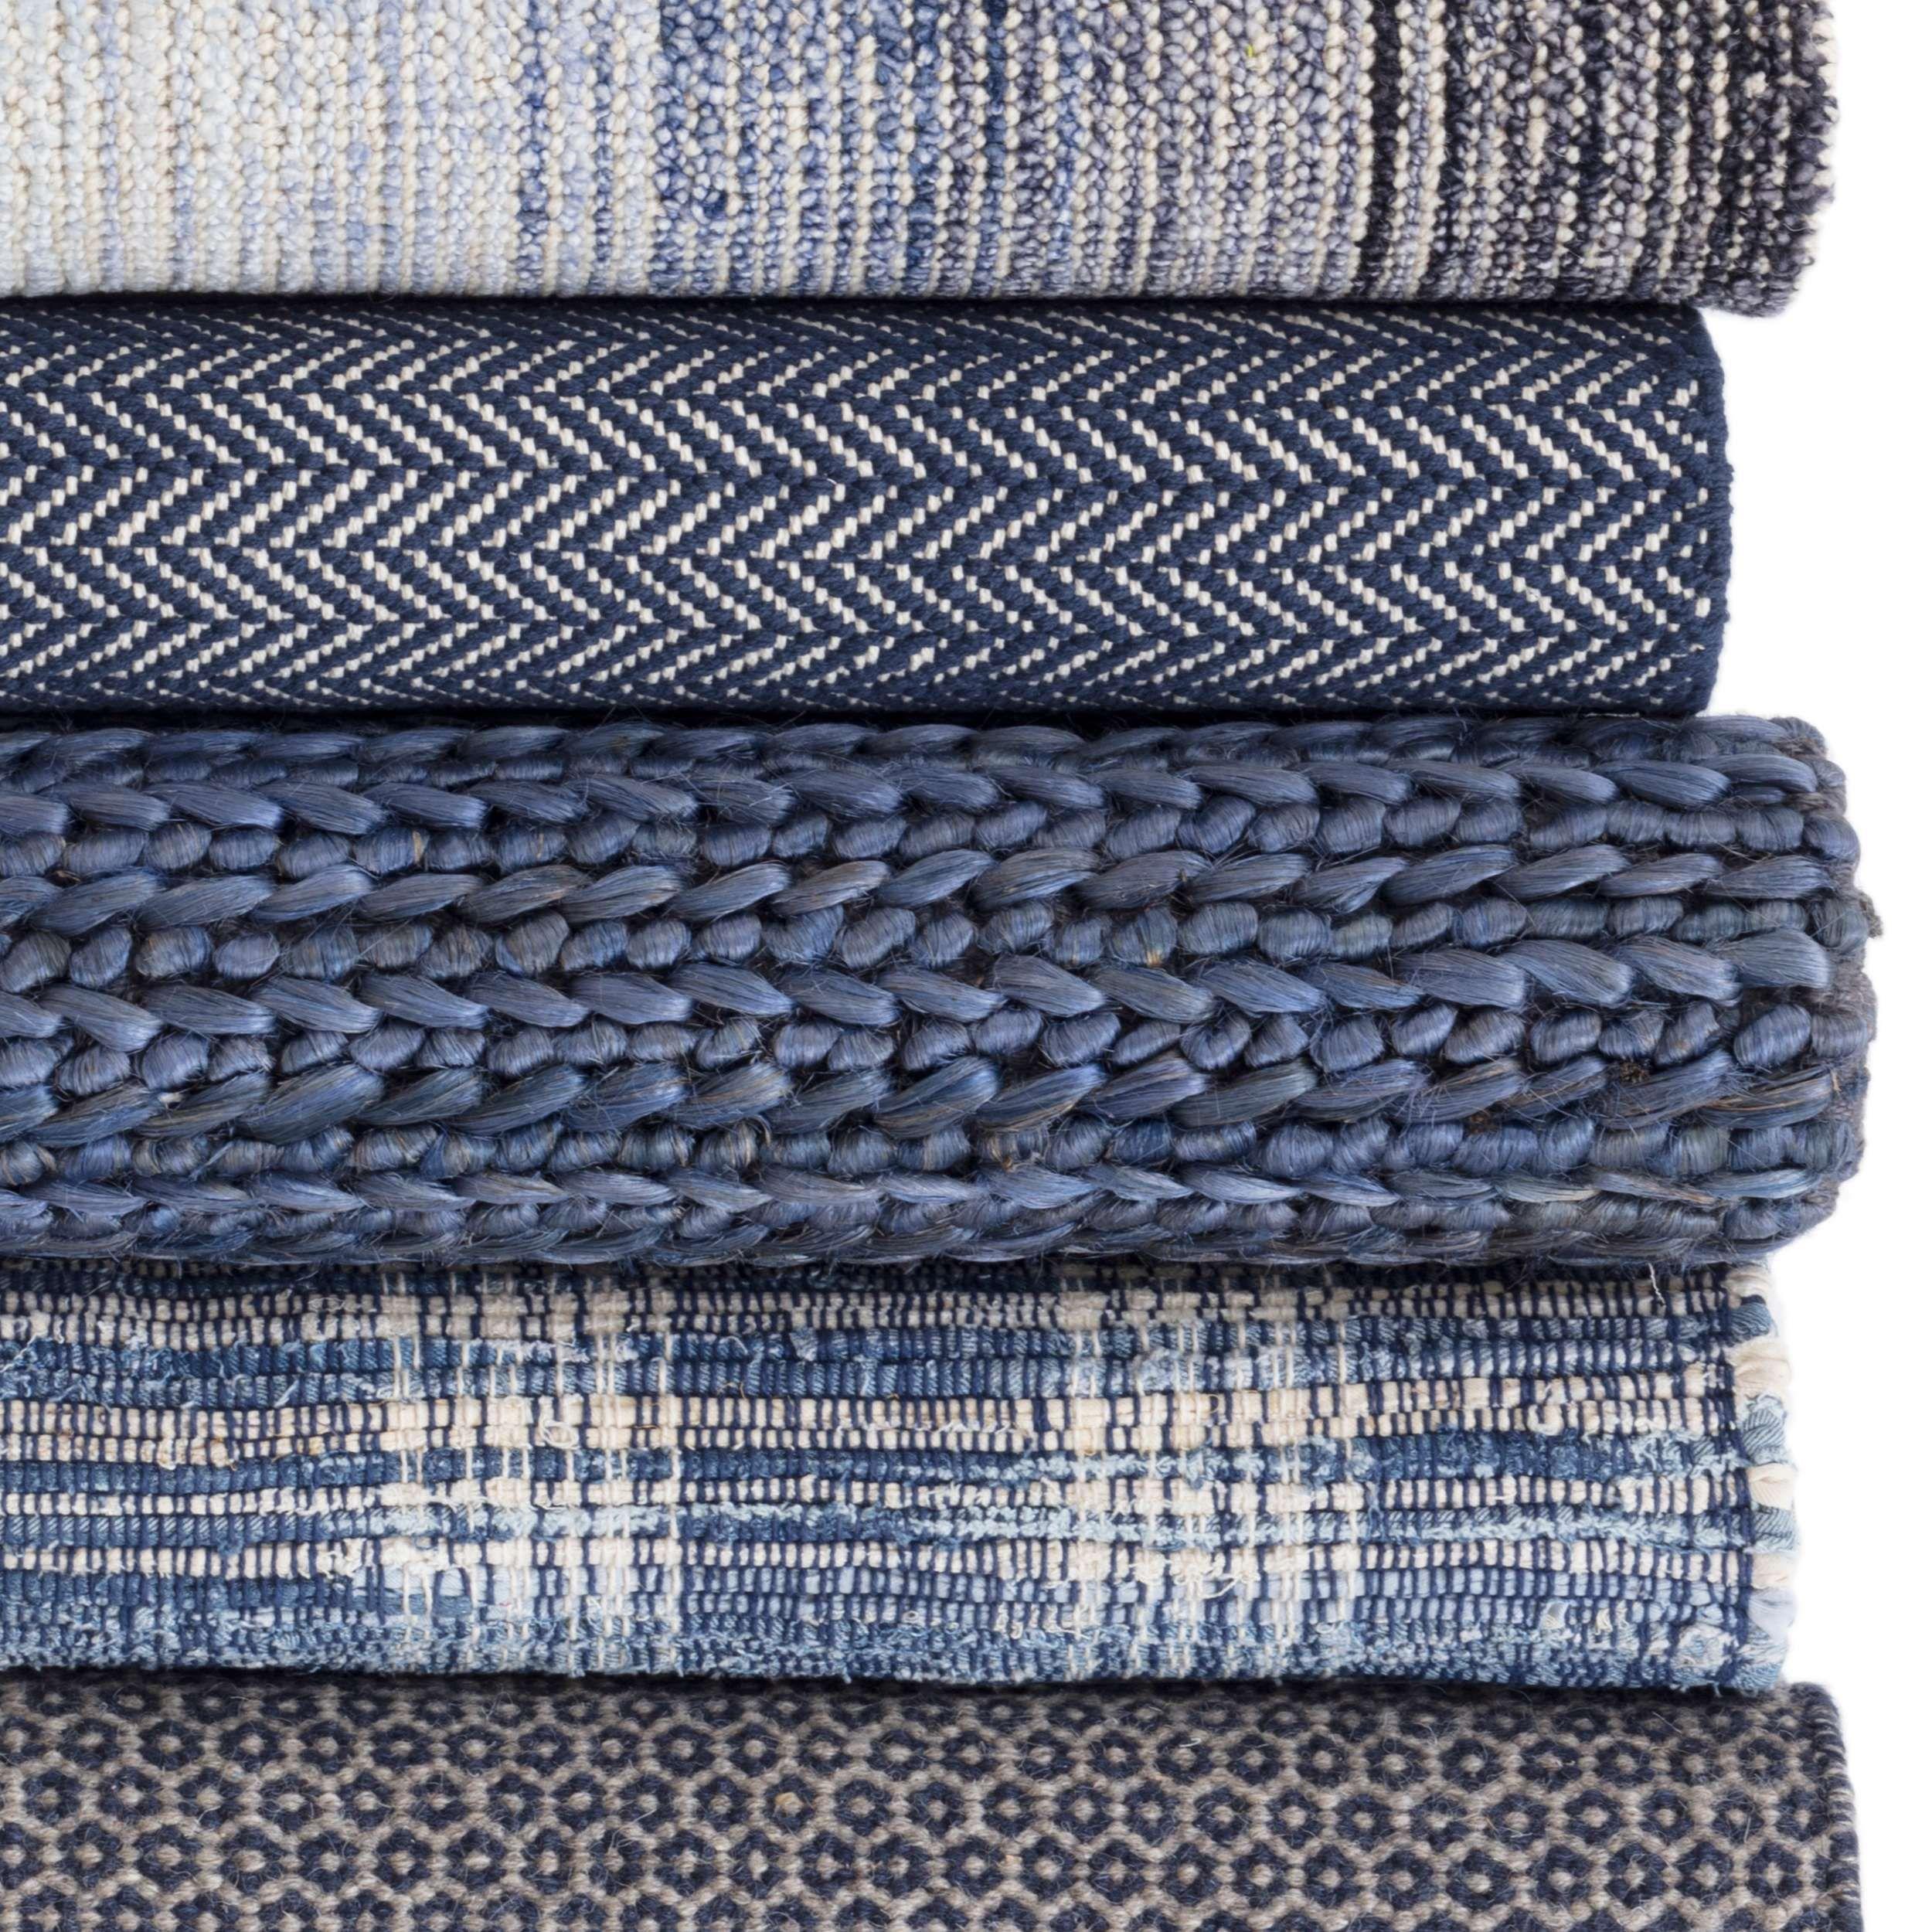 Denim Plaid Woven Cotton Rug Dash Albert In 2020 Rugs Woven Rug Wool Area Rugs